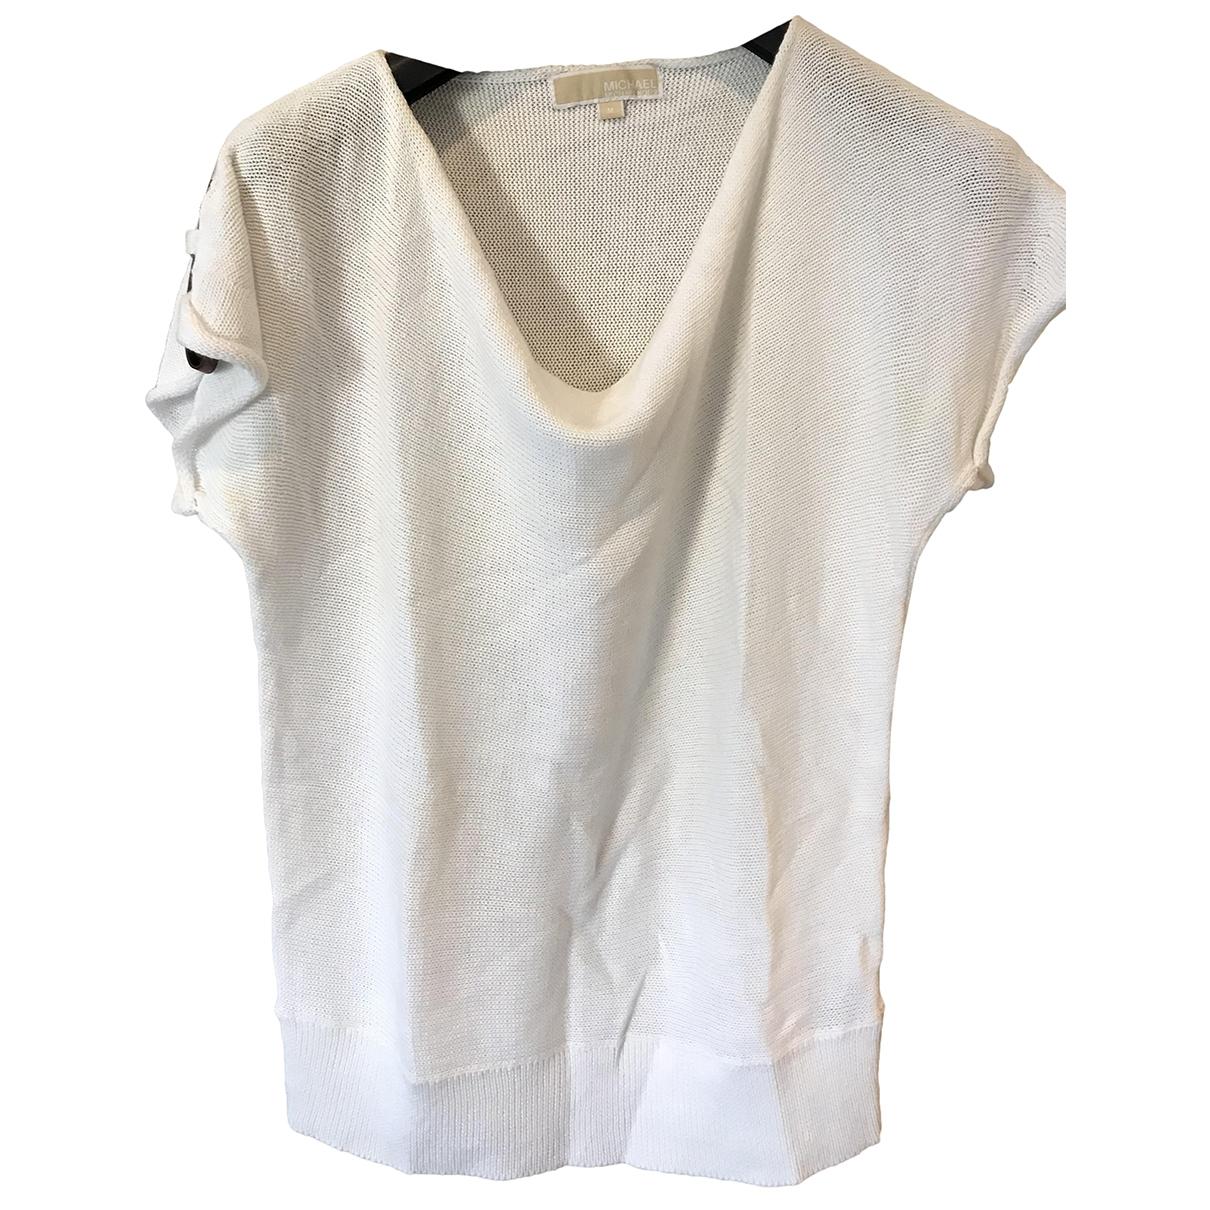 Michael Kors \N White Cotton  top for Women M International